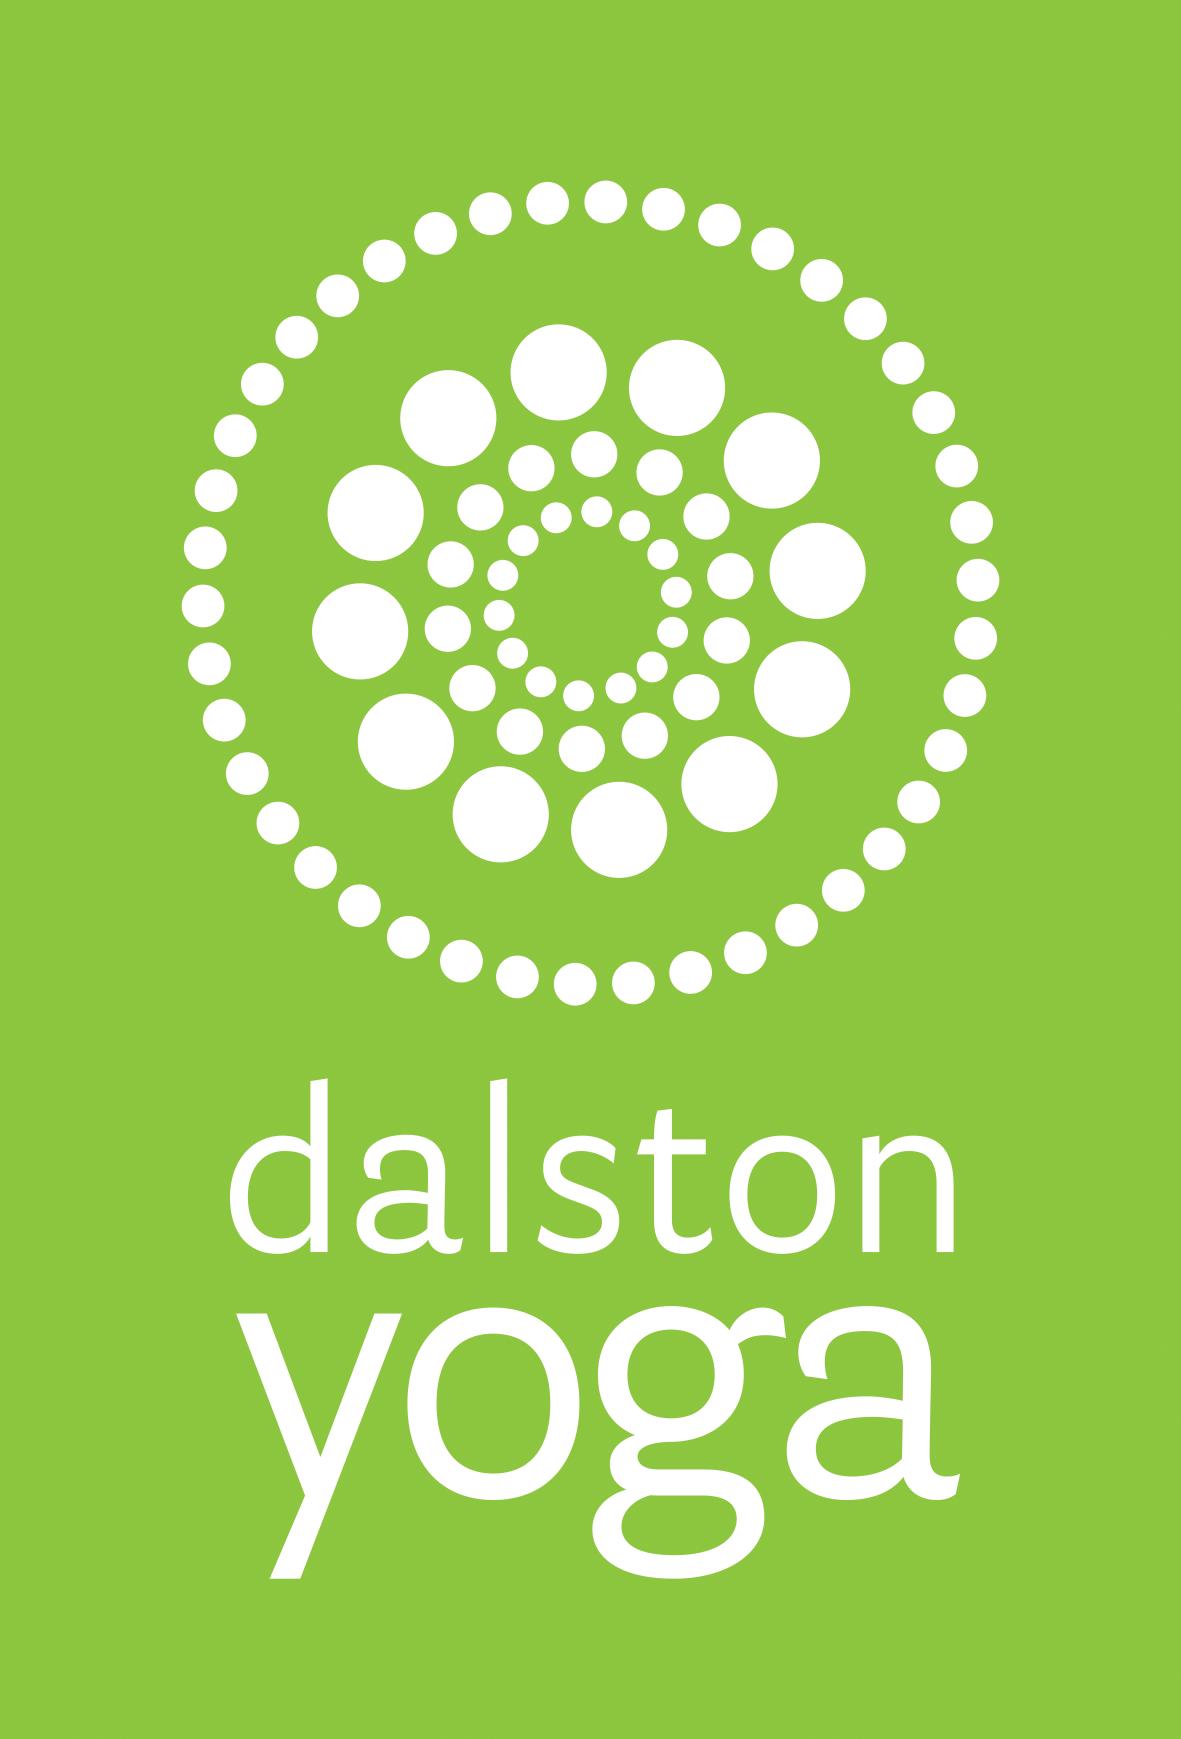 Dalston Yoga